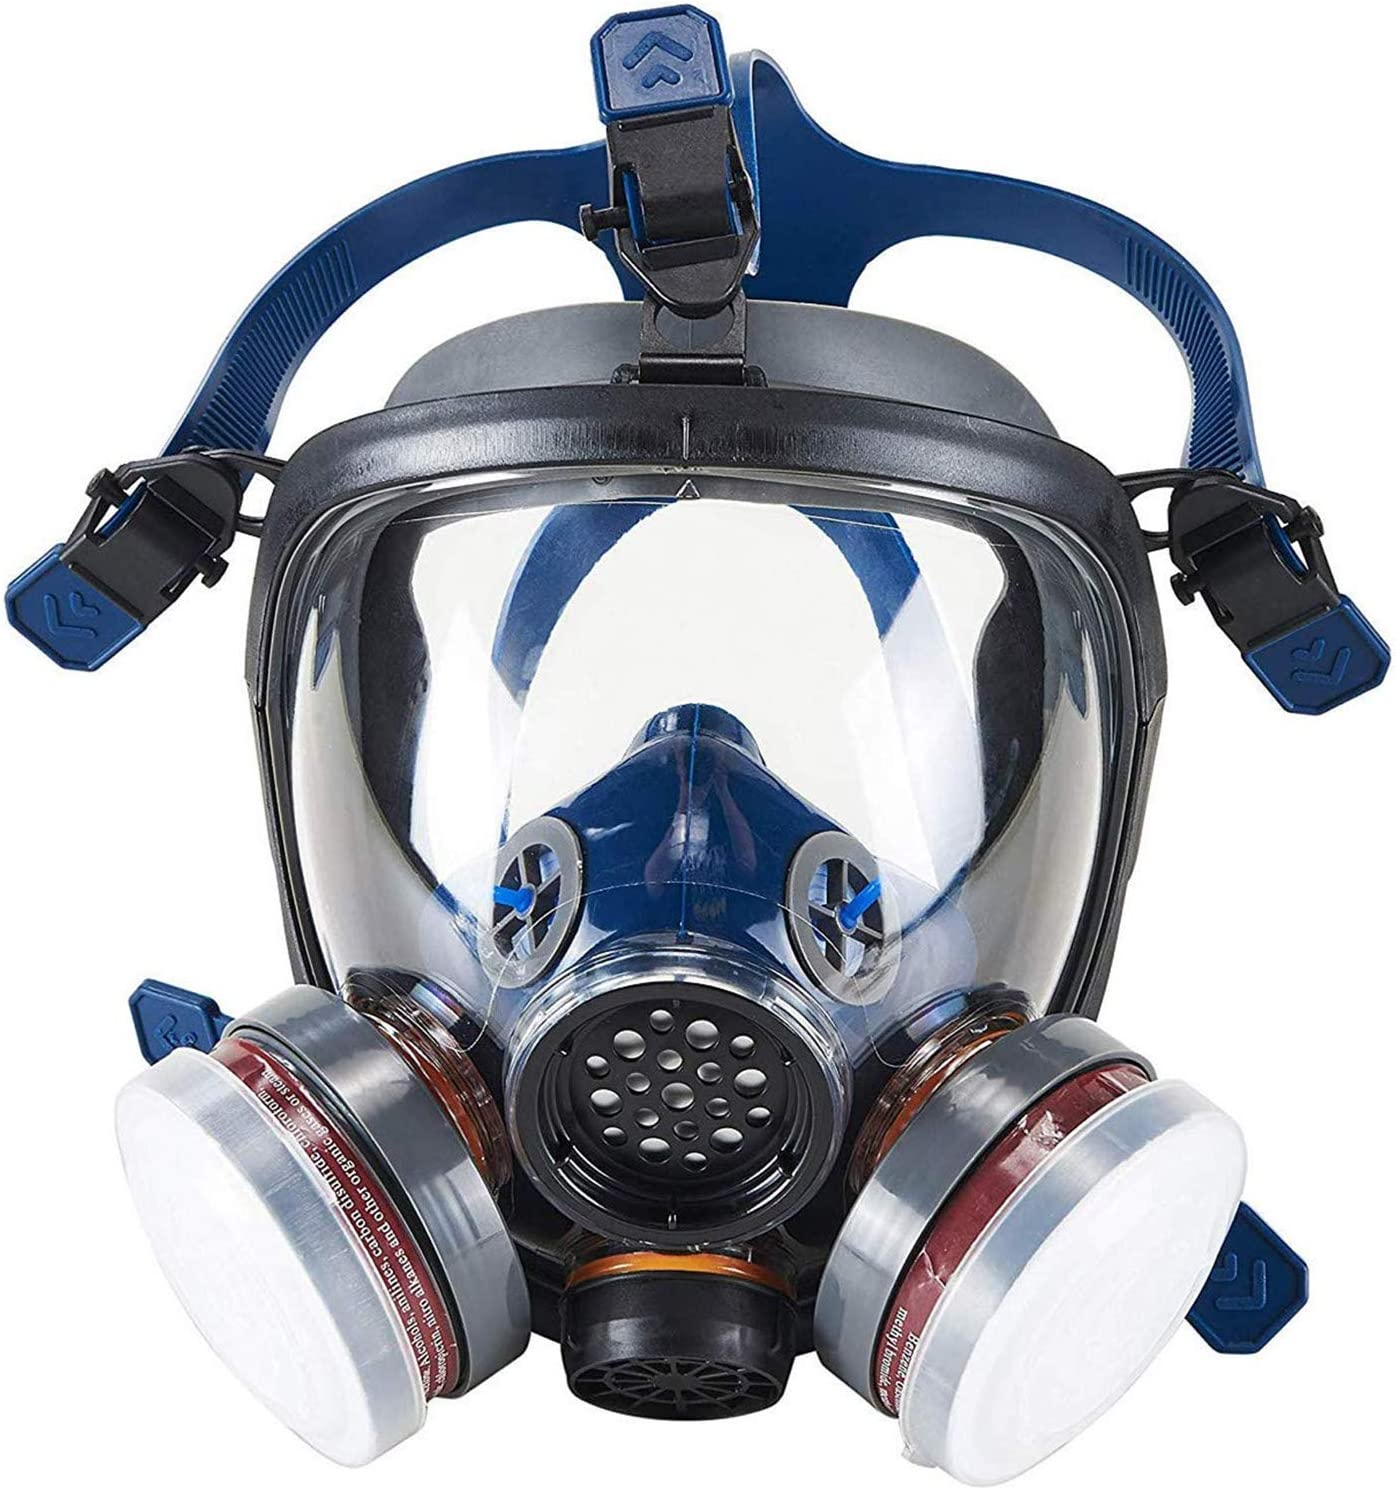 IVSUN – IV-100 - best respirator for spray painting